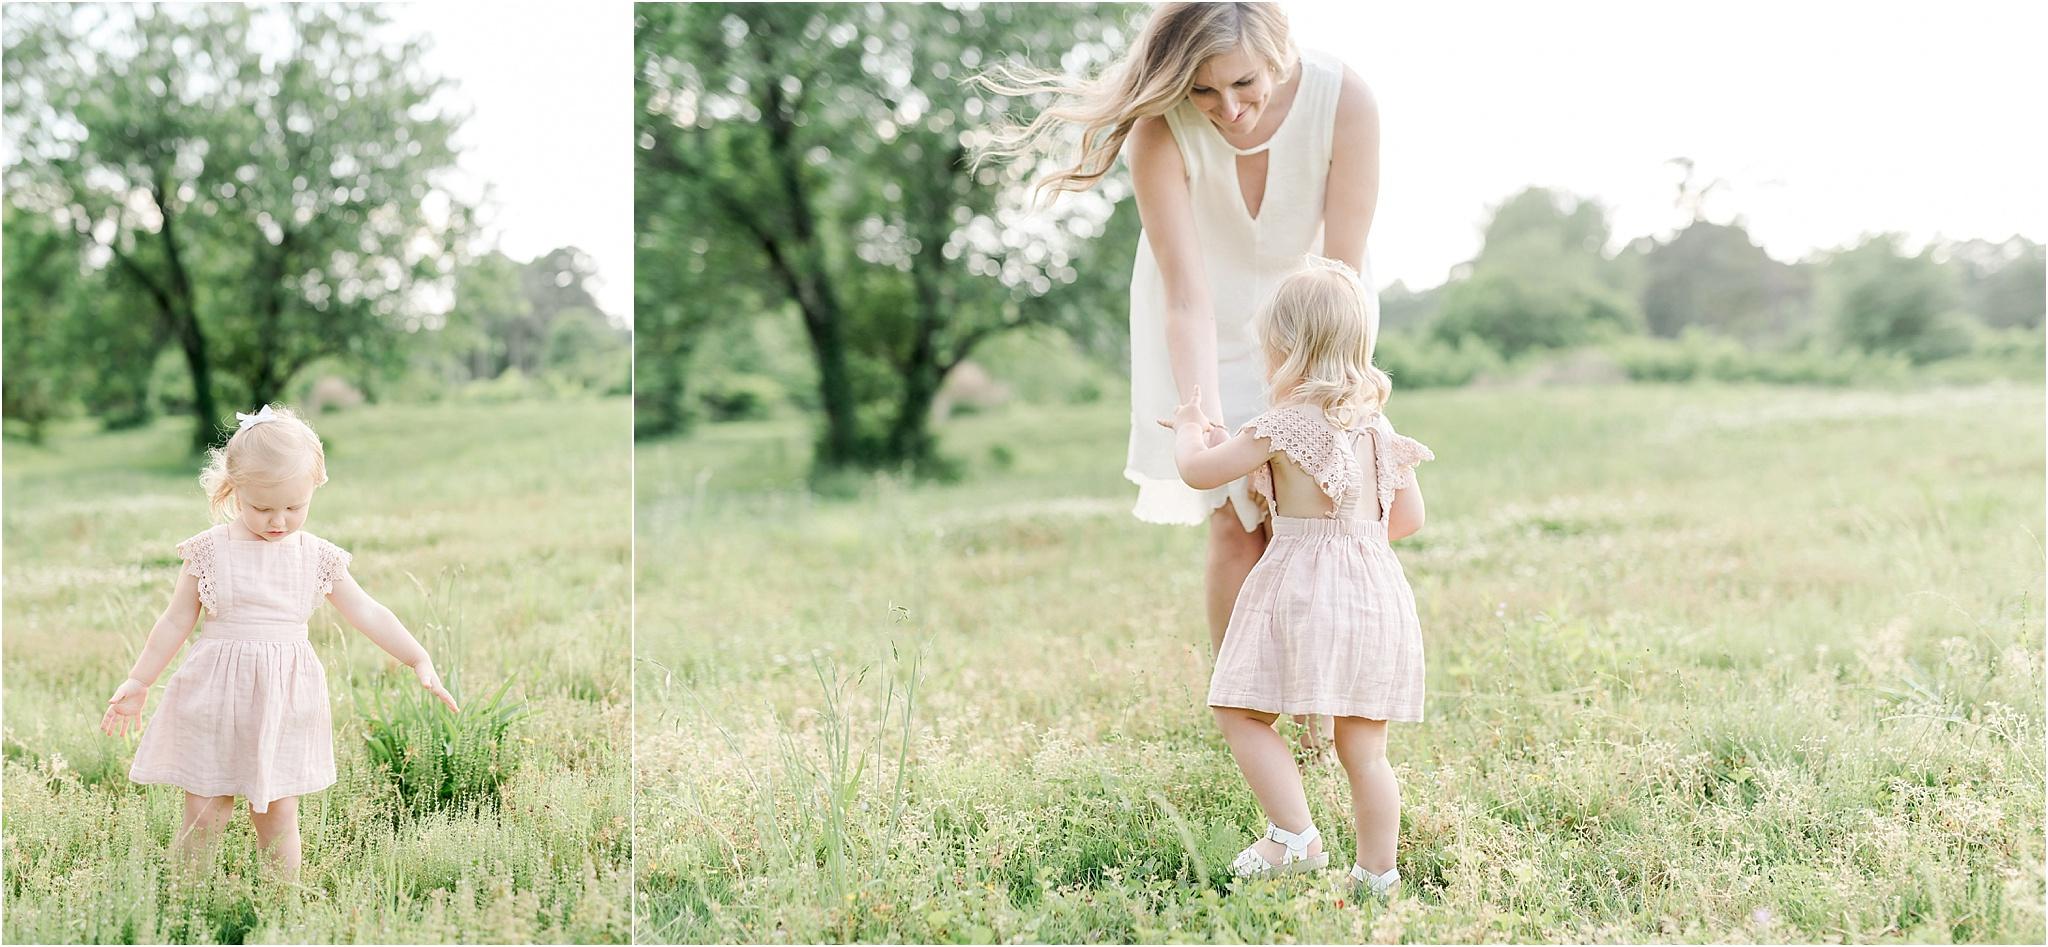 Rachel_Bond_Birmingham_AL-family-photography_0003.jpg